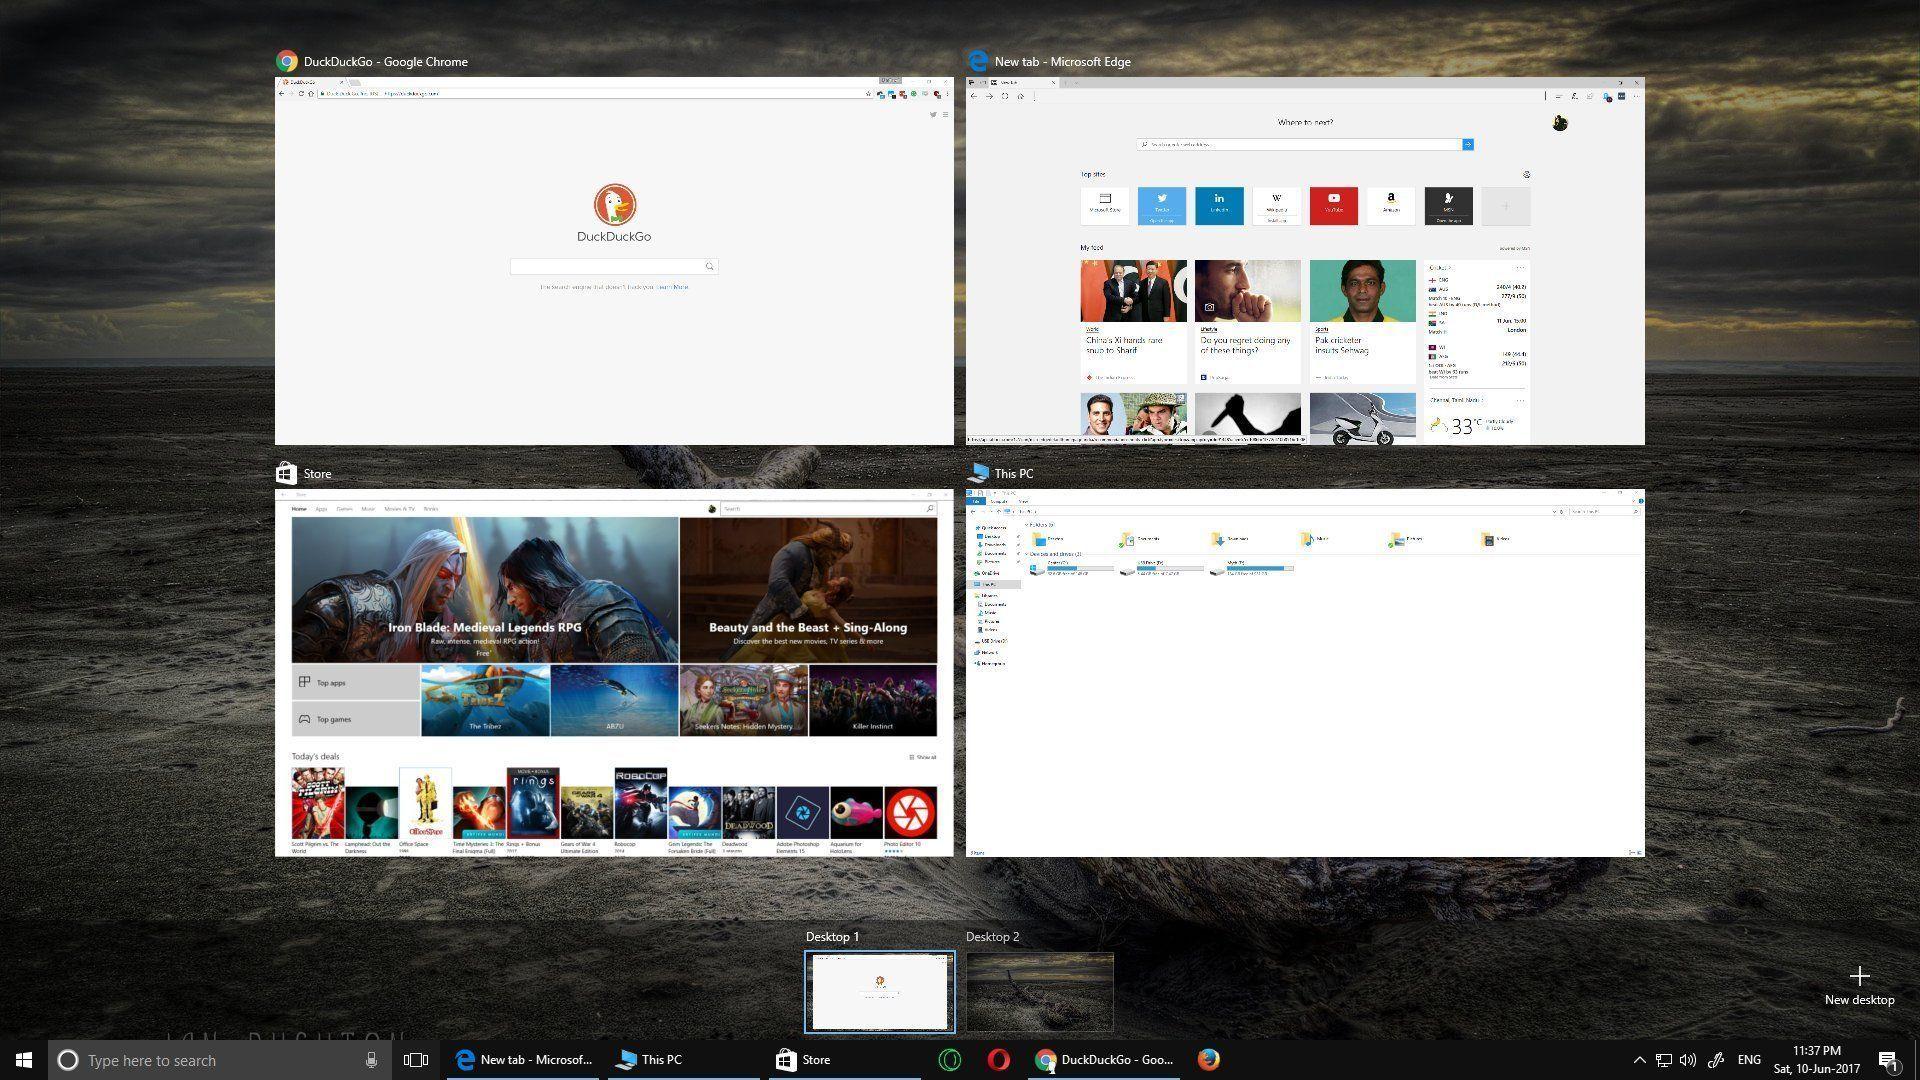 Windows 10 - Multiple Desktops